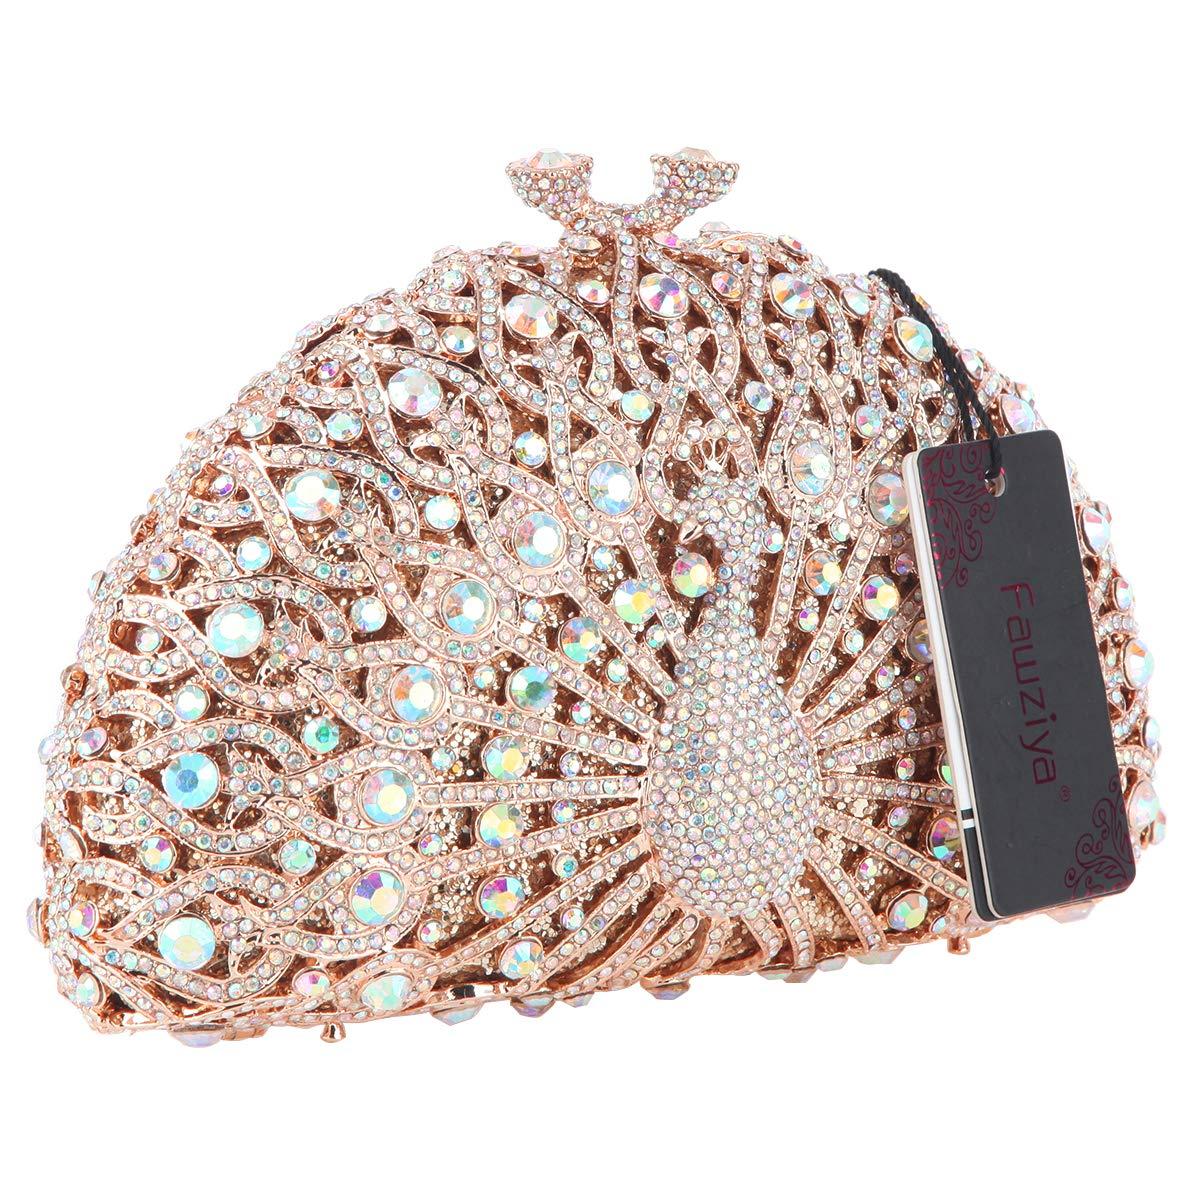 Amazon.com: fawziya embragues vidrio de lujo para las ...